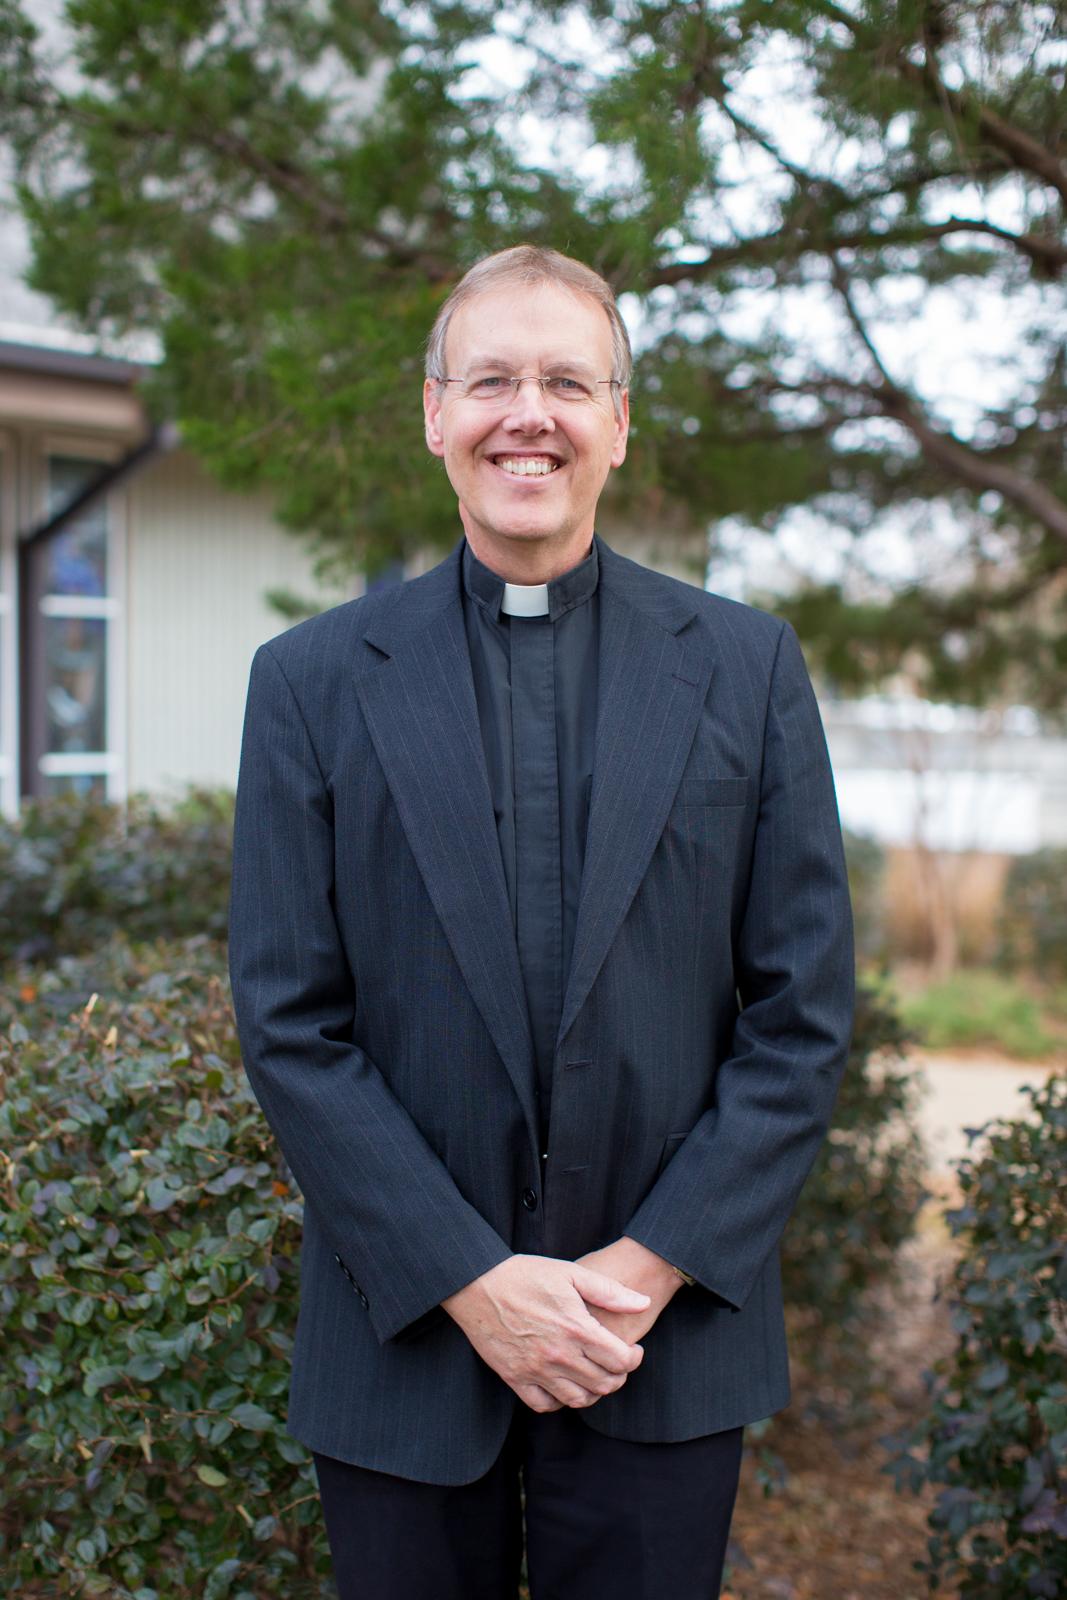 Rev. Dr. James A. Holowach